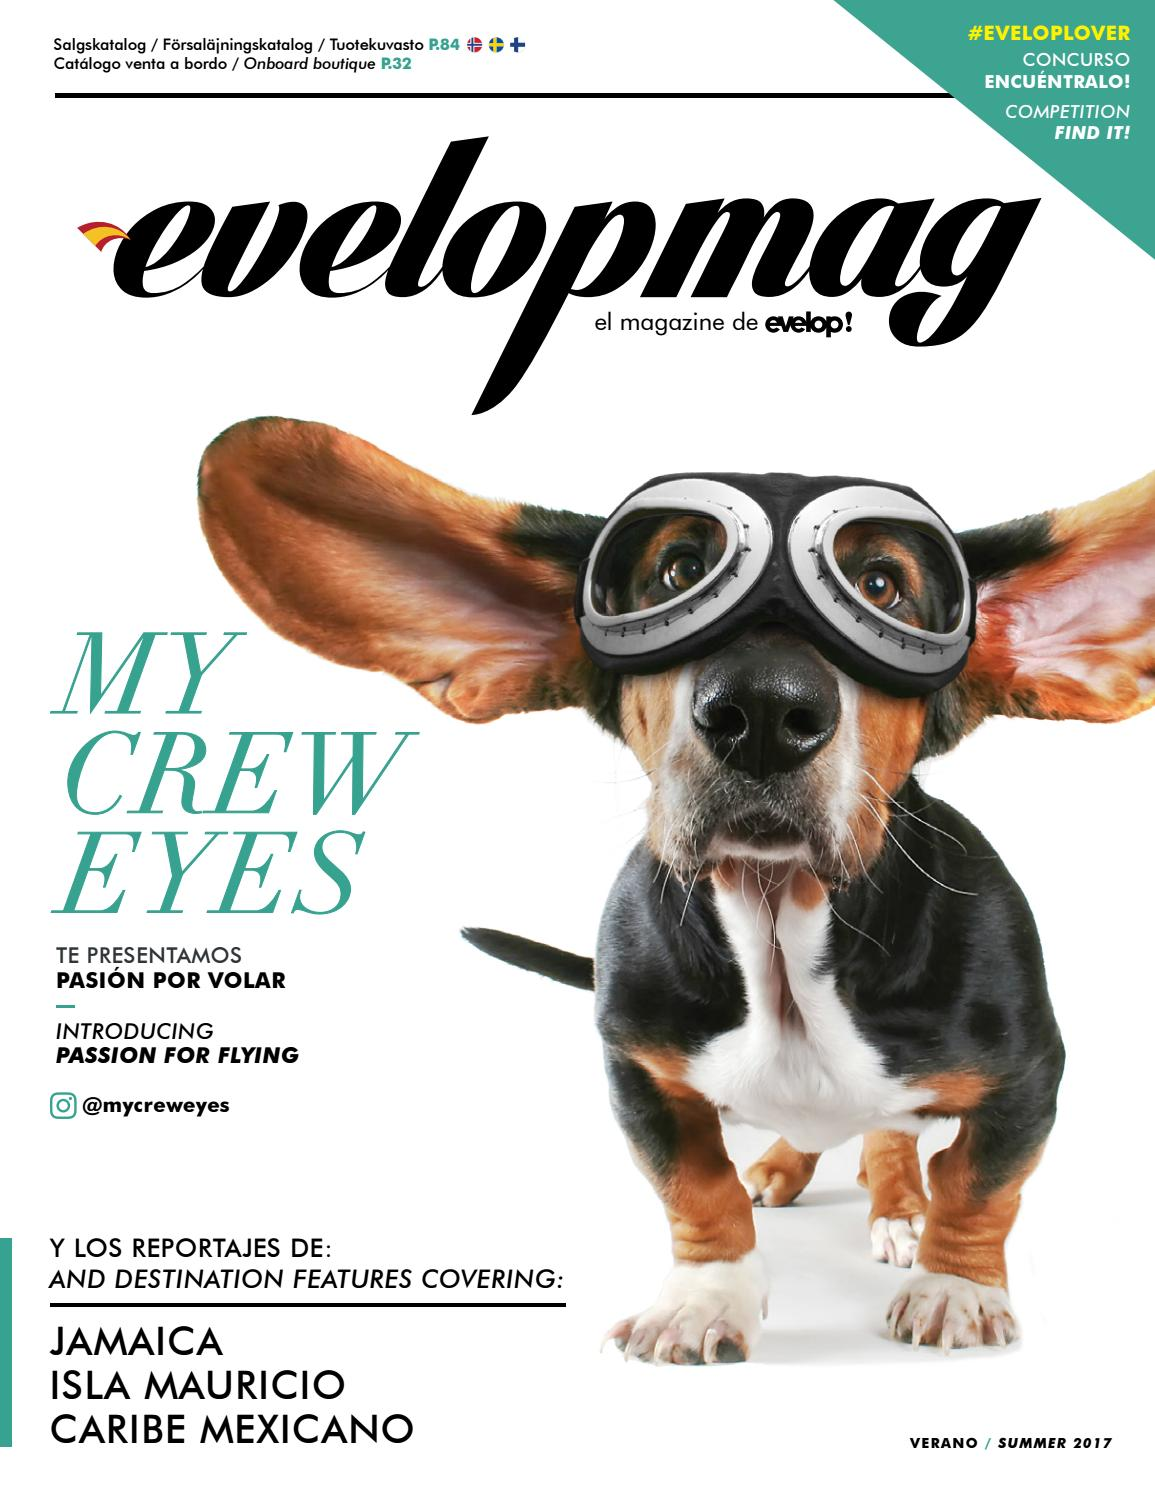 894d205d6f4a Revista evelop verano 2017 by Evelop - issuu